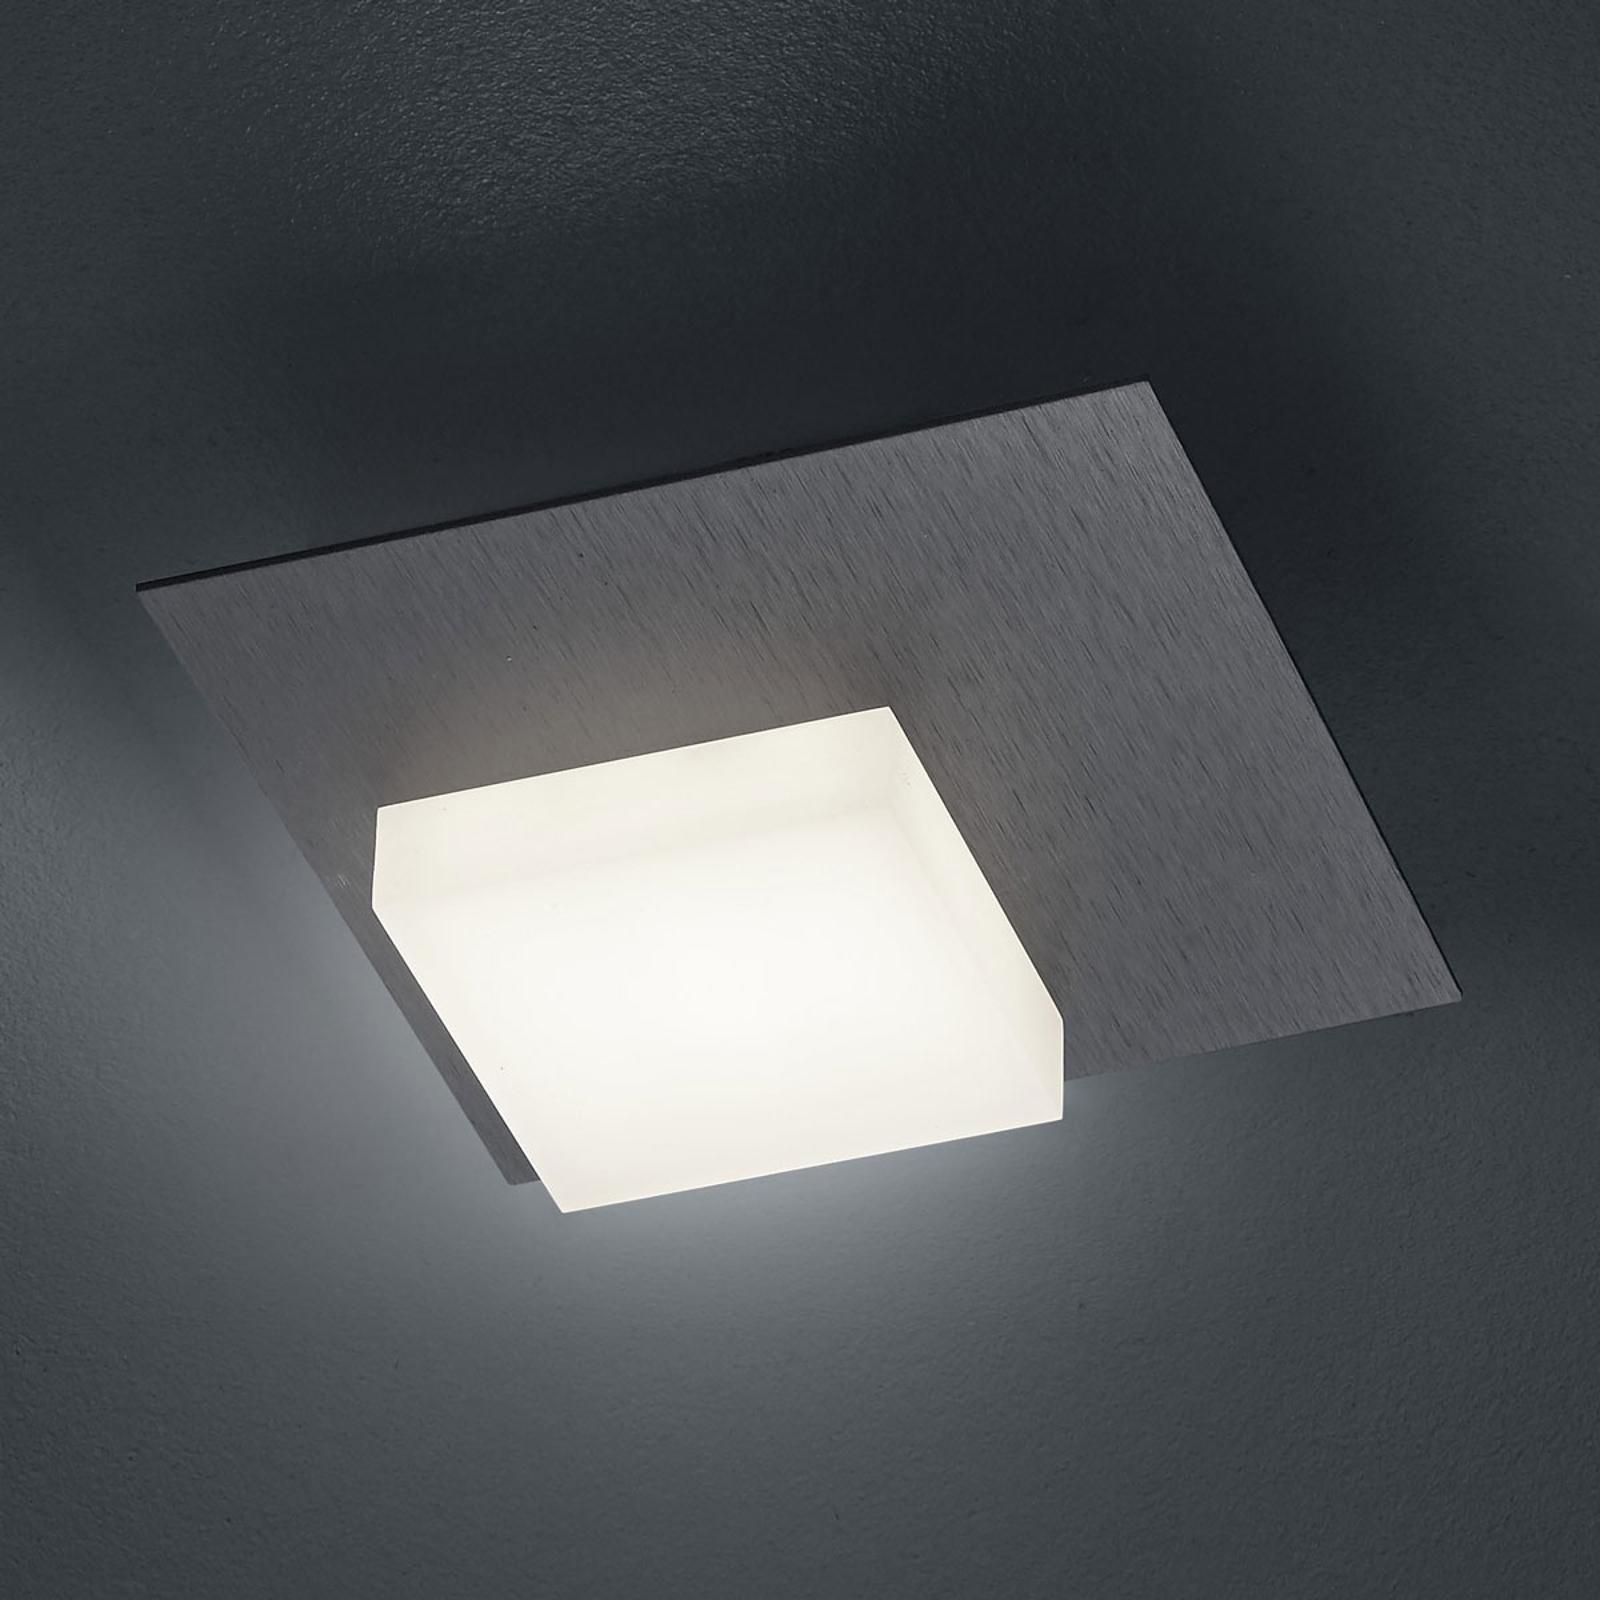 BANKAMP Cube lampa sufitowa LED 8W, antracyt